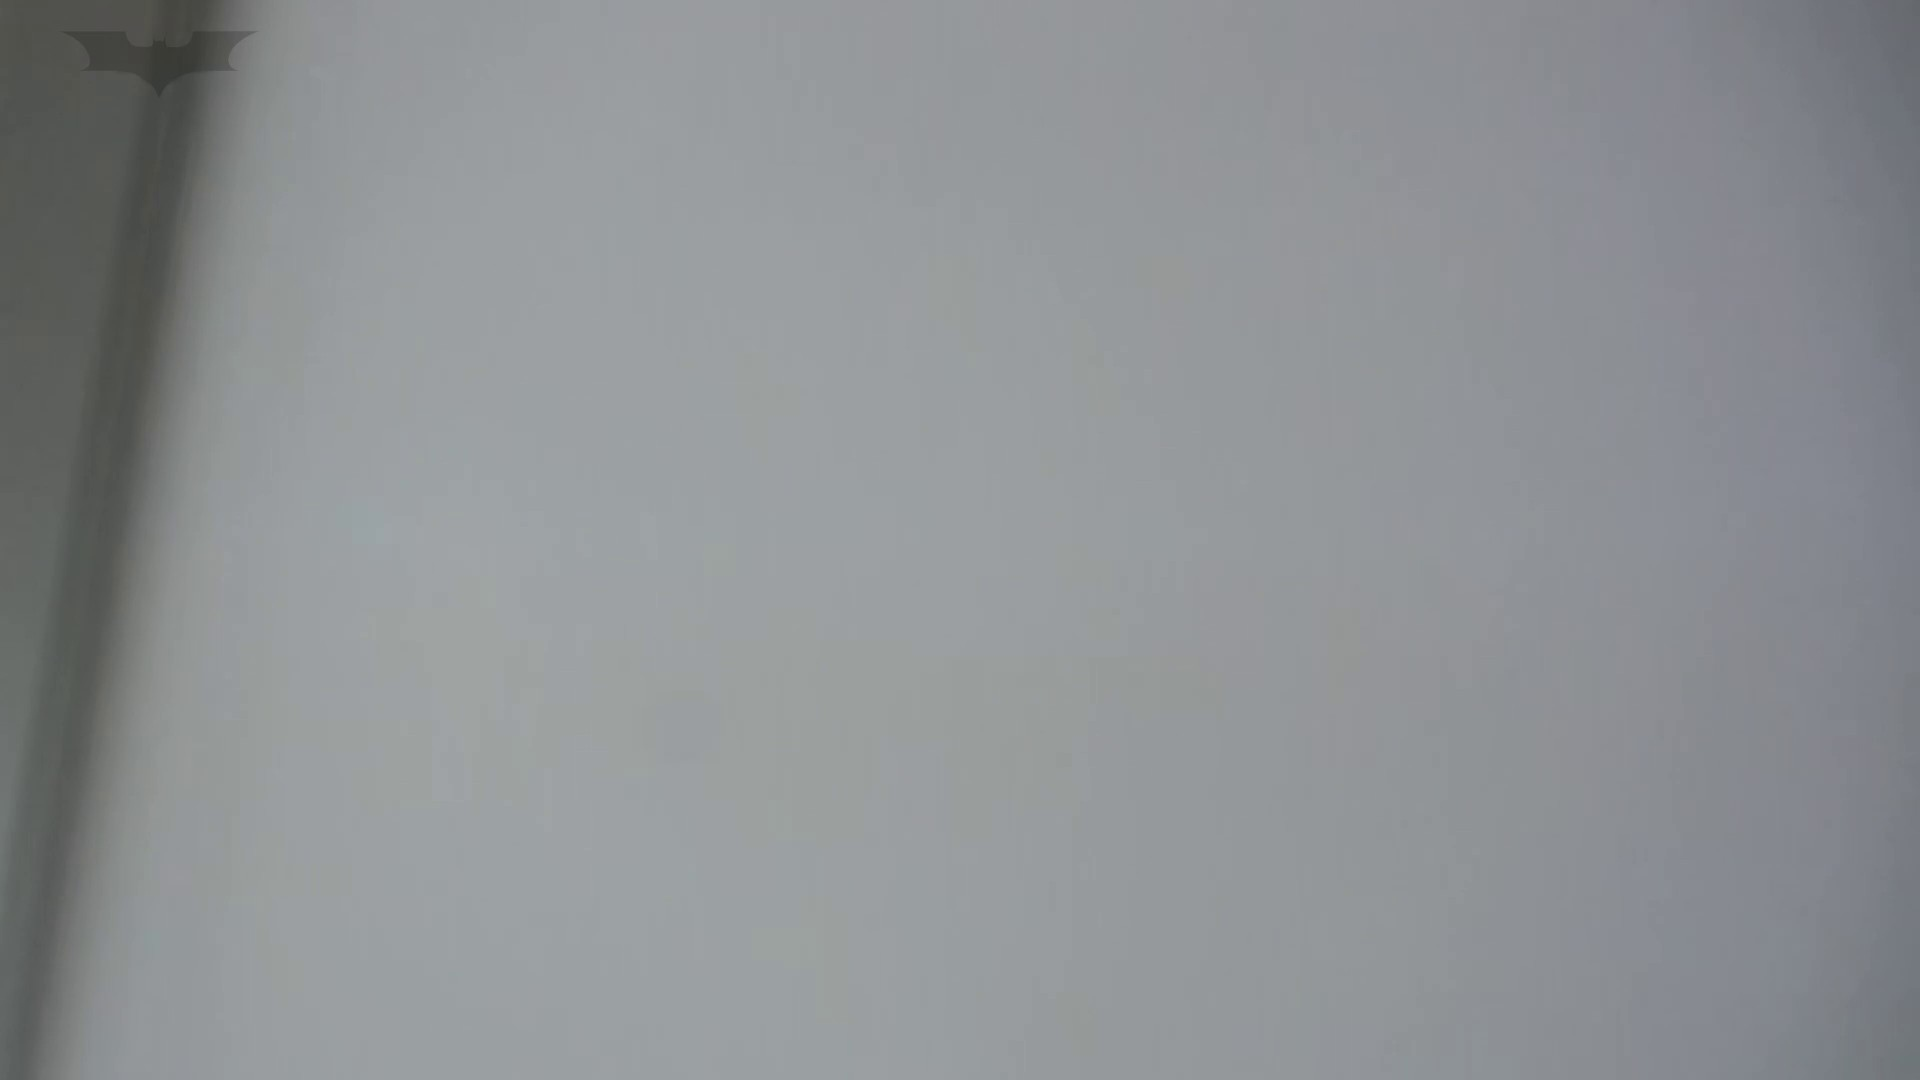 化粧室絵巻 駅舎編 VOL.22 季節外れの冬服特集!! 黄金水 戯れ無修正画像 91画像 87